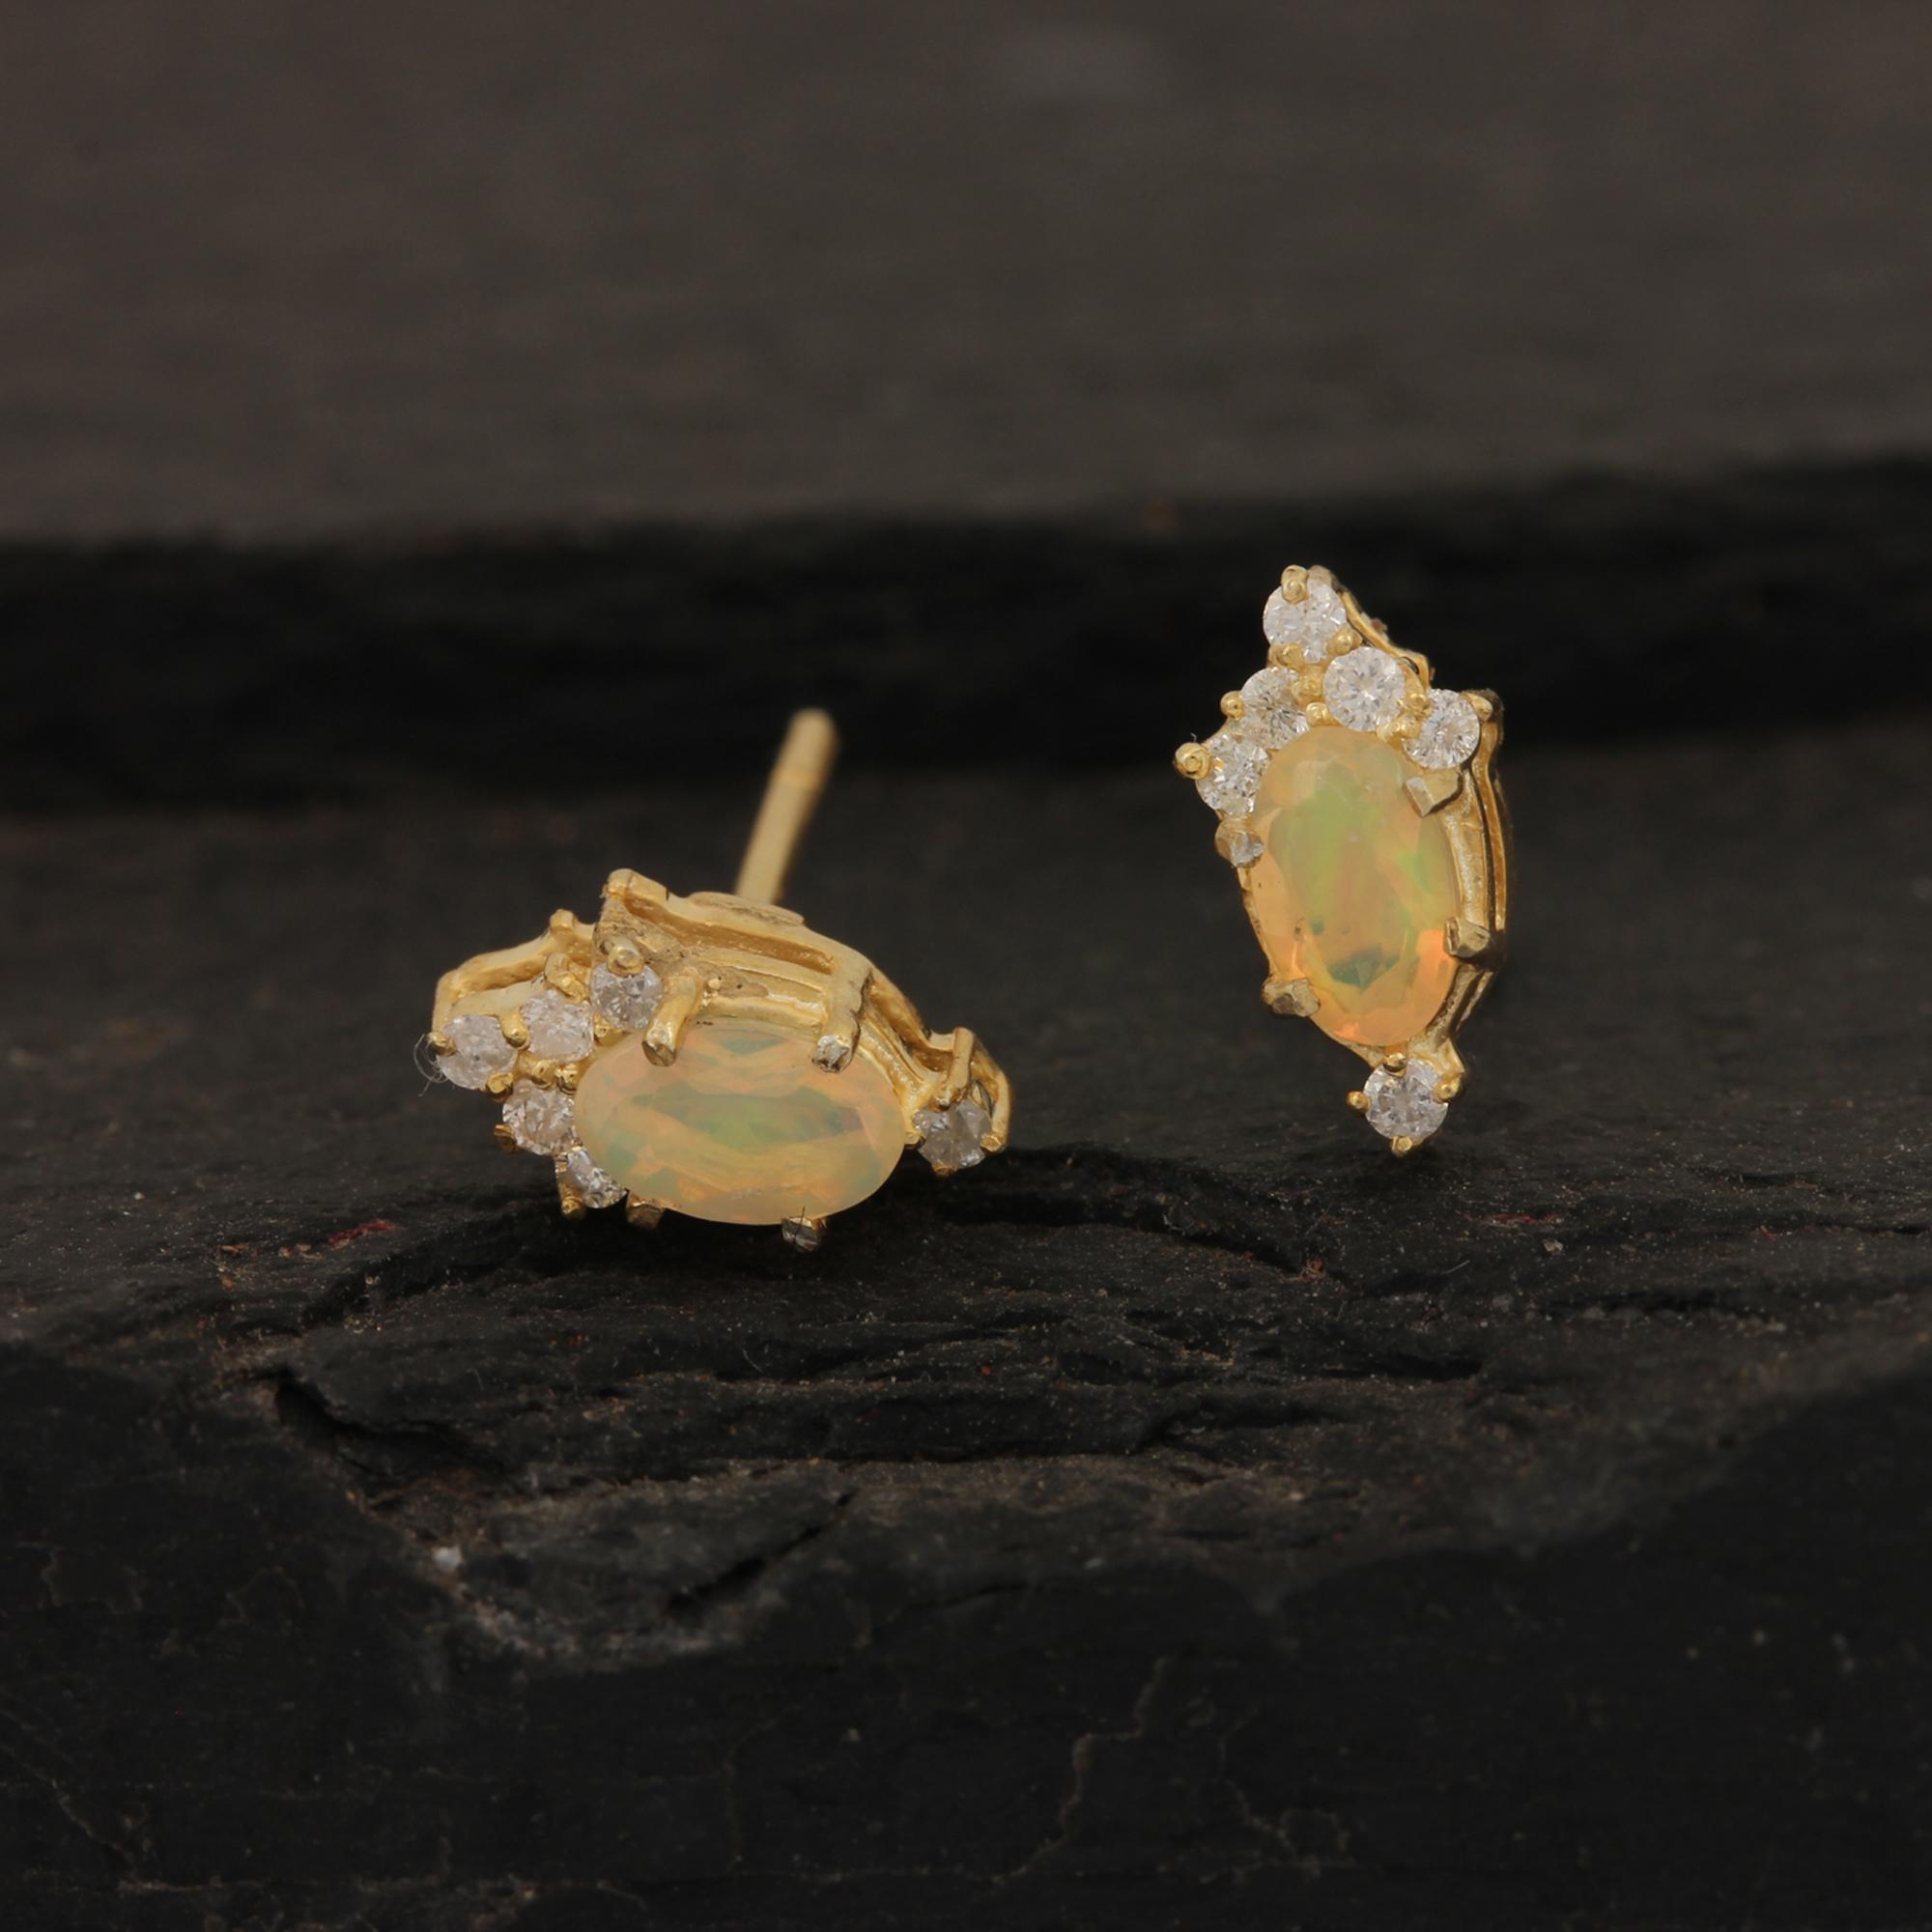 Natural Opal 14k Solid Gold Diamond Stud Earrings